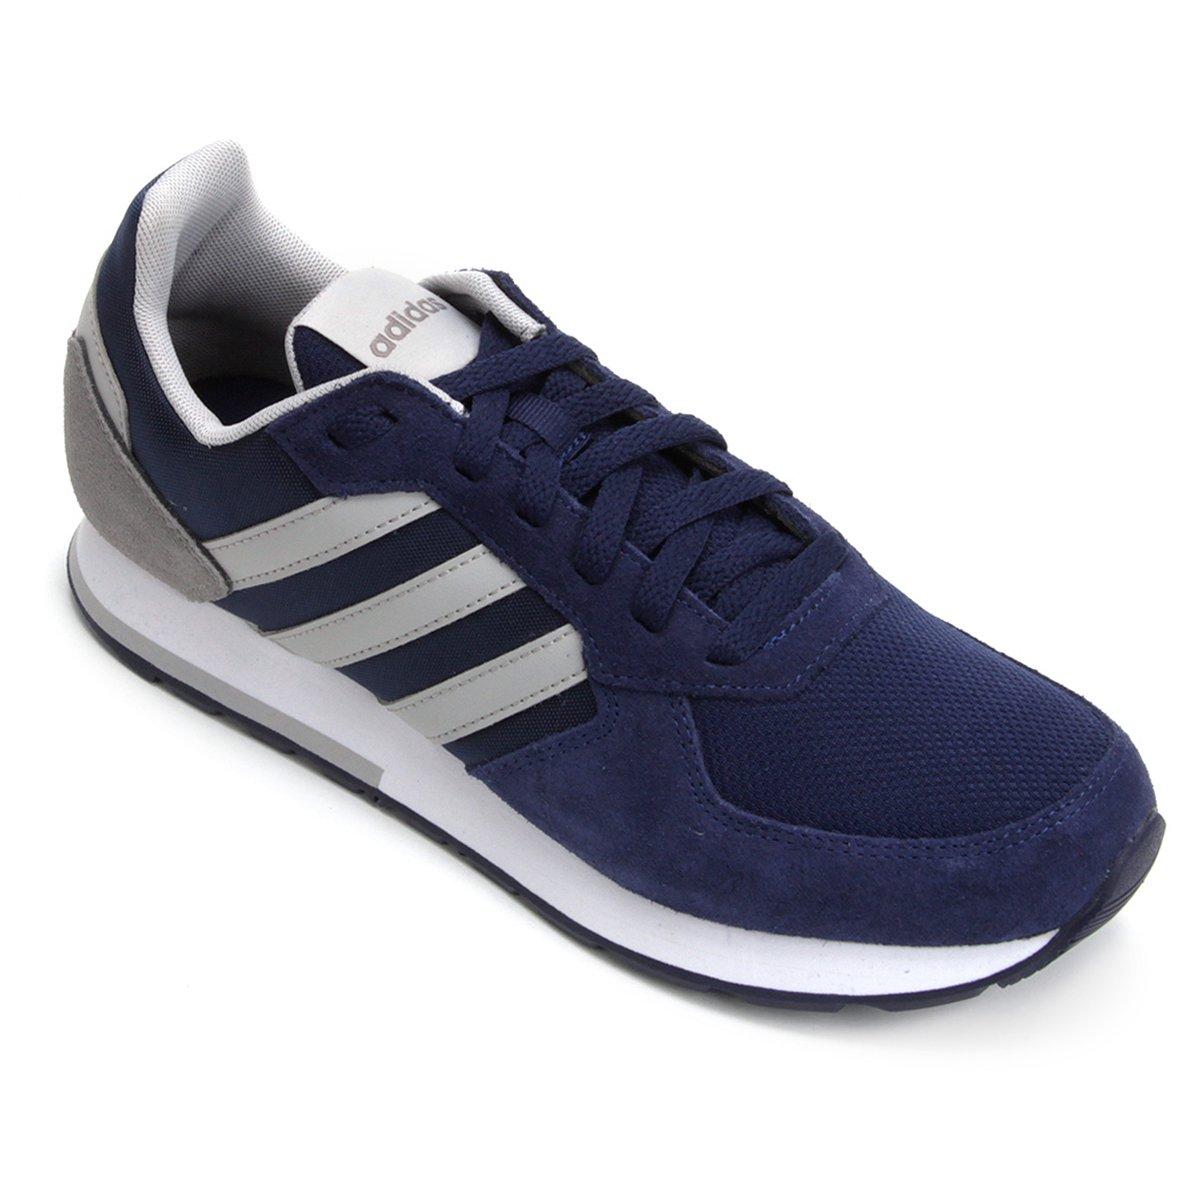 5b0b8a1d4bca7 Tênis Adidas 8K Masculino - Azul e Cinza - Compre Agora